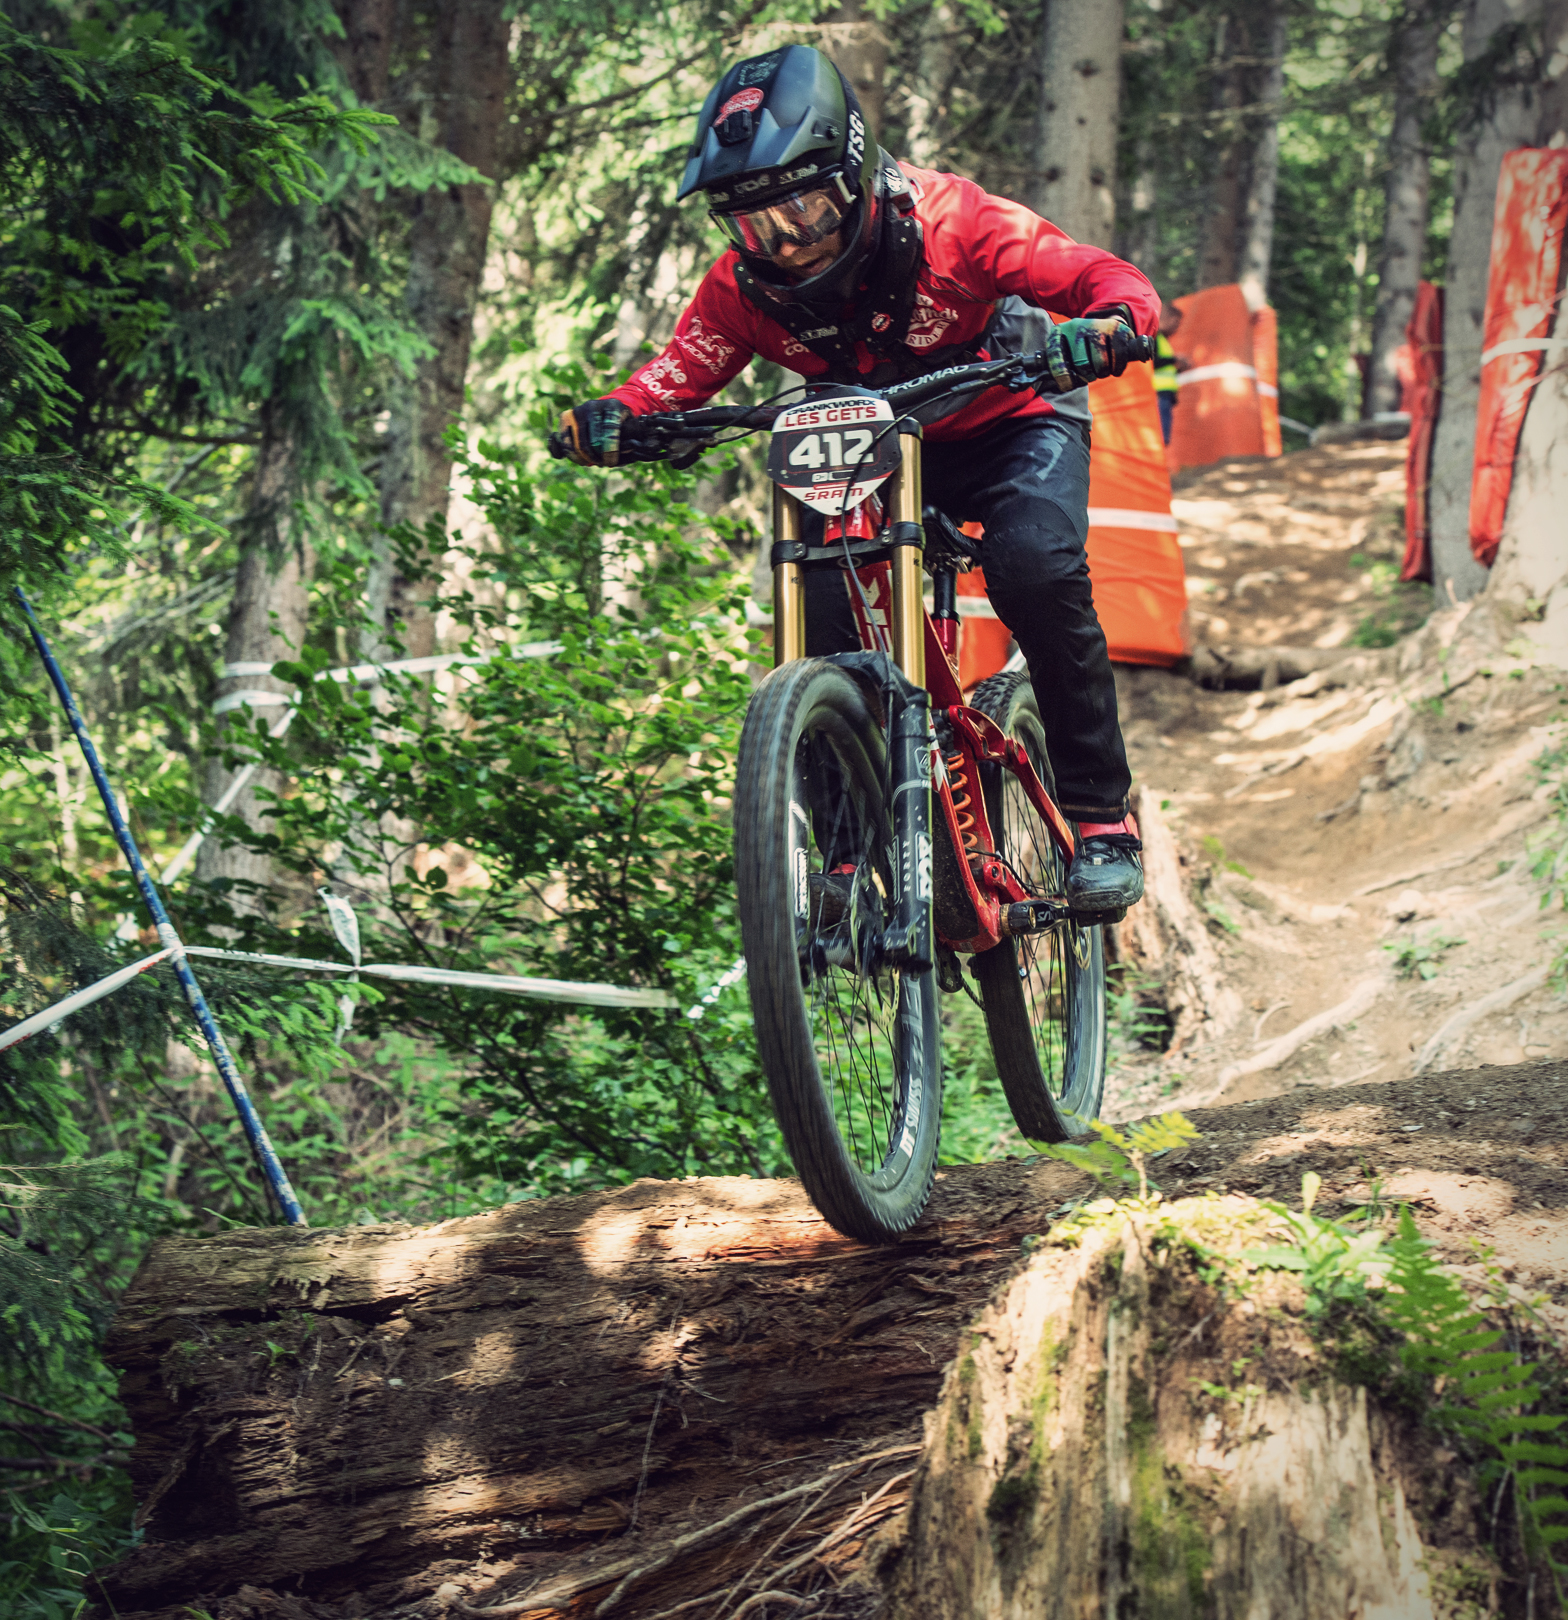 Dominik Wifmer at the Crankworx Les Gets 2018 Downhill.